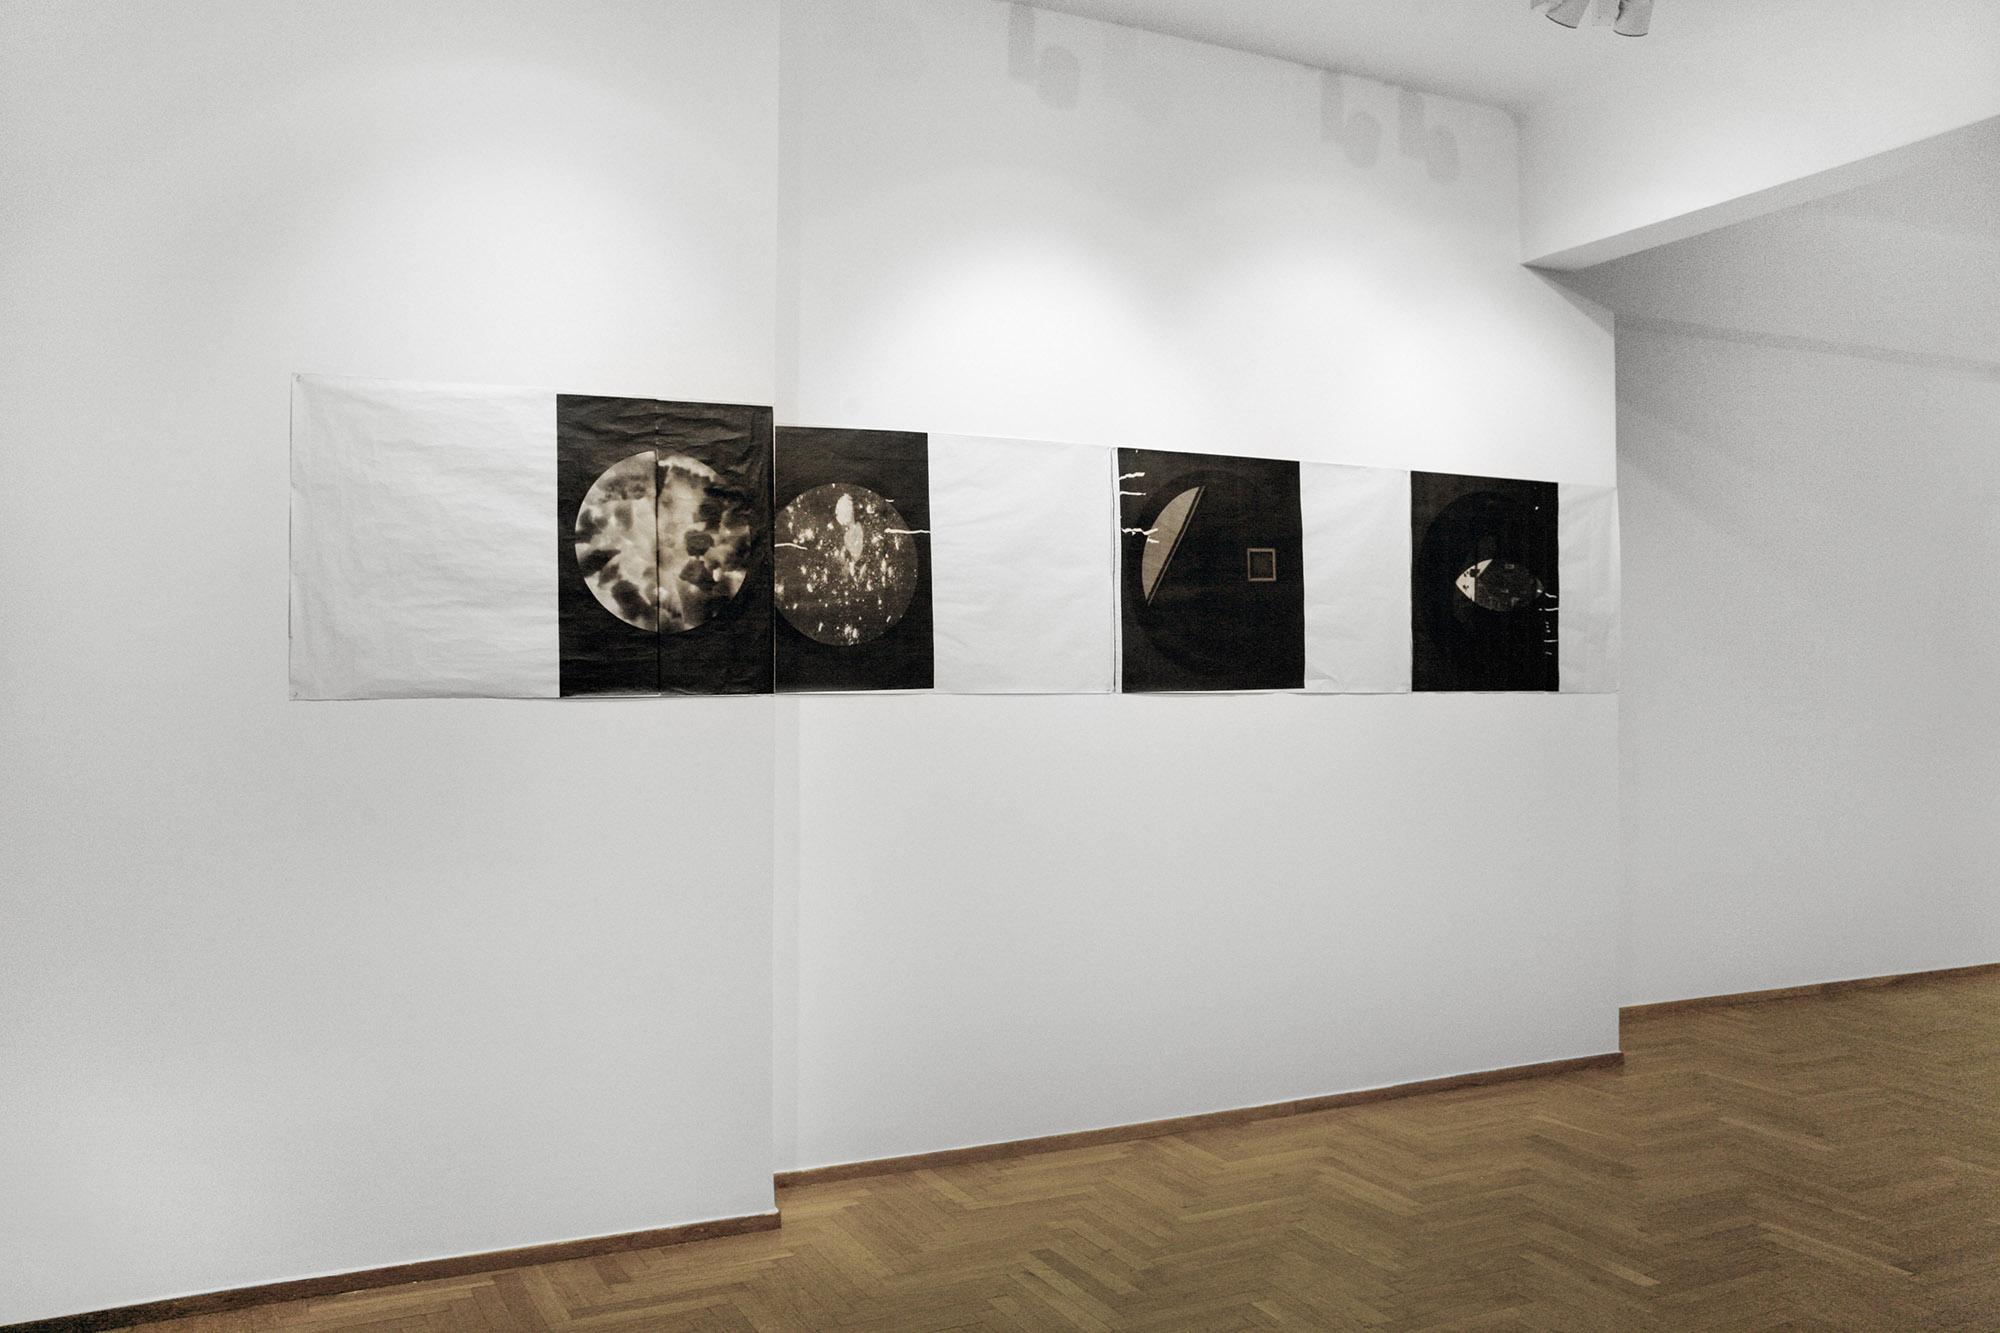 Ioanna Gouzeli / Spacesheep - Image 0